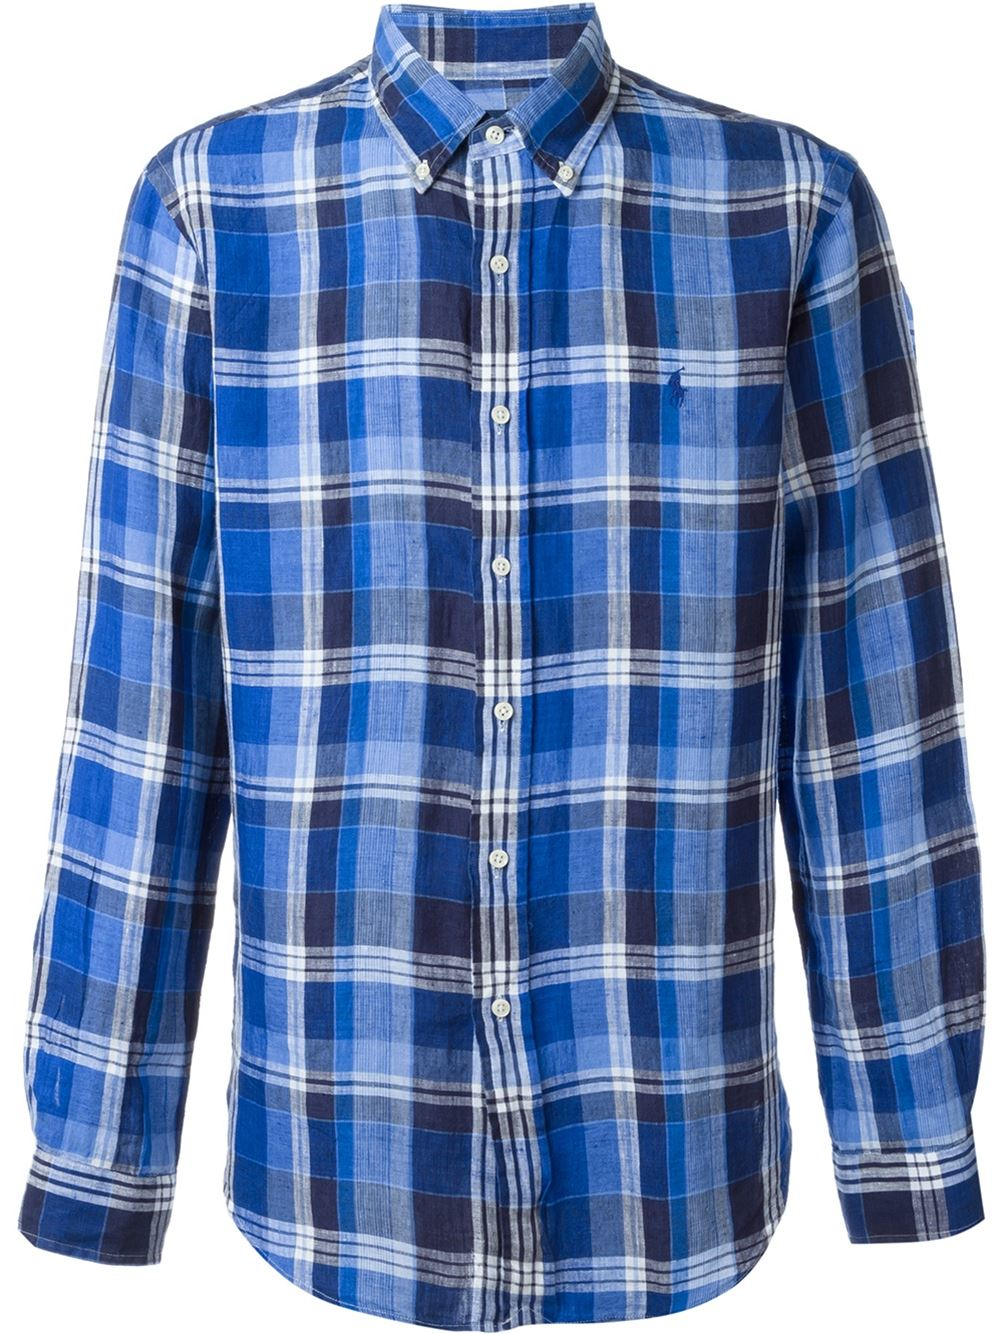 Mens Linen Camp Shirts Linen Short Sleeve Slub Camp Collar